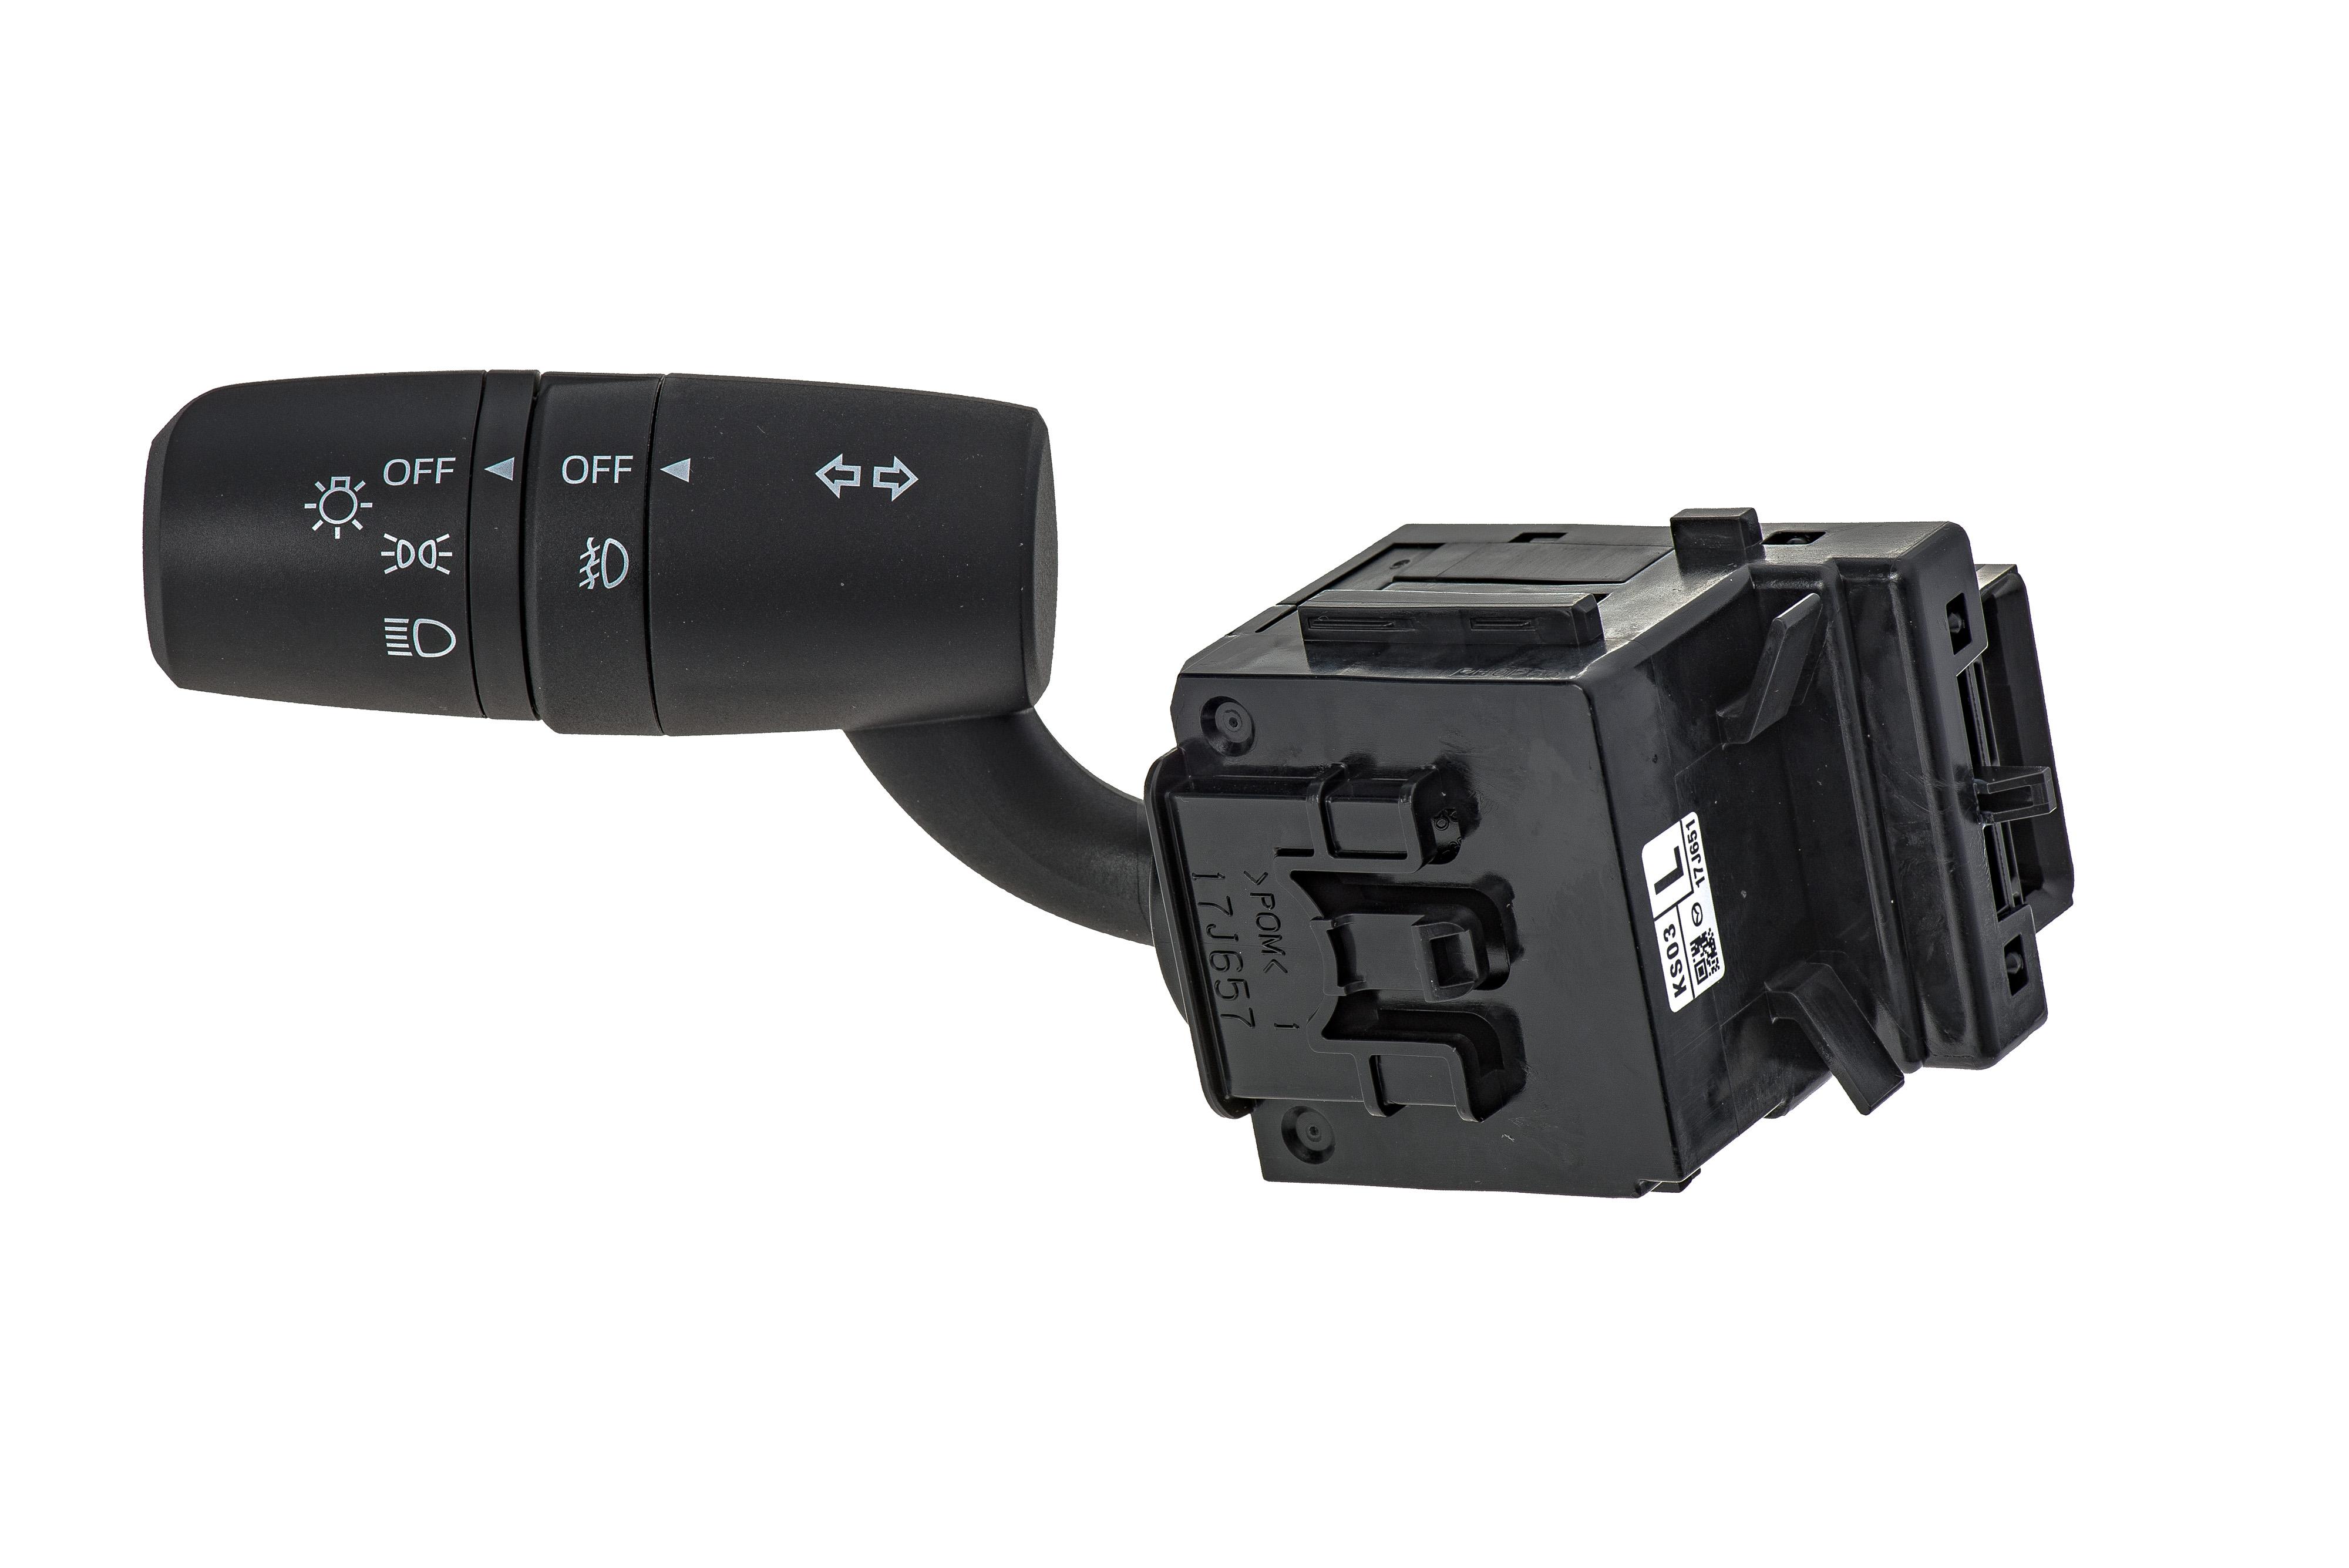 cx lighting control panel wiring diagram 2001 chevy s10 blazer radio 2015 mazda 9 front door switch 48